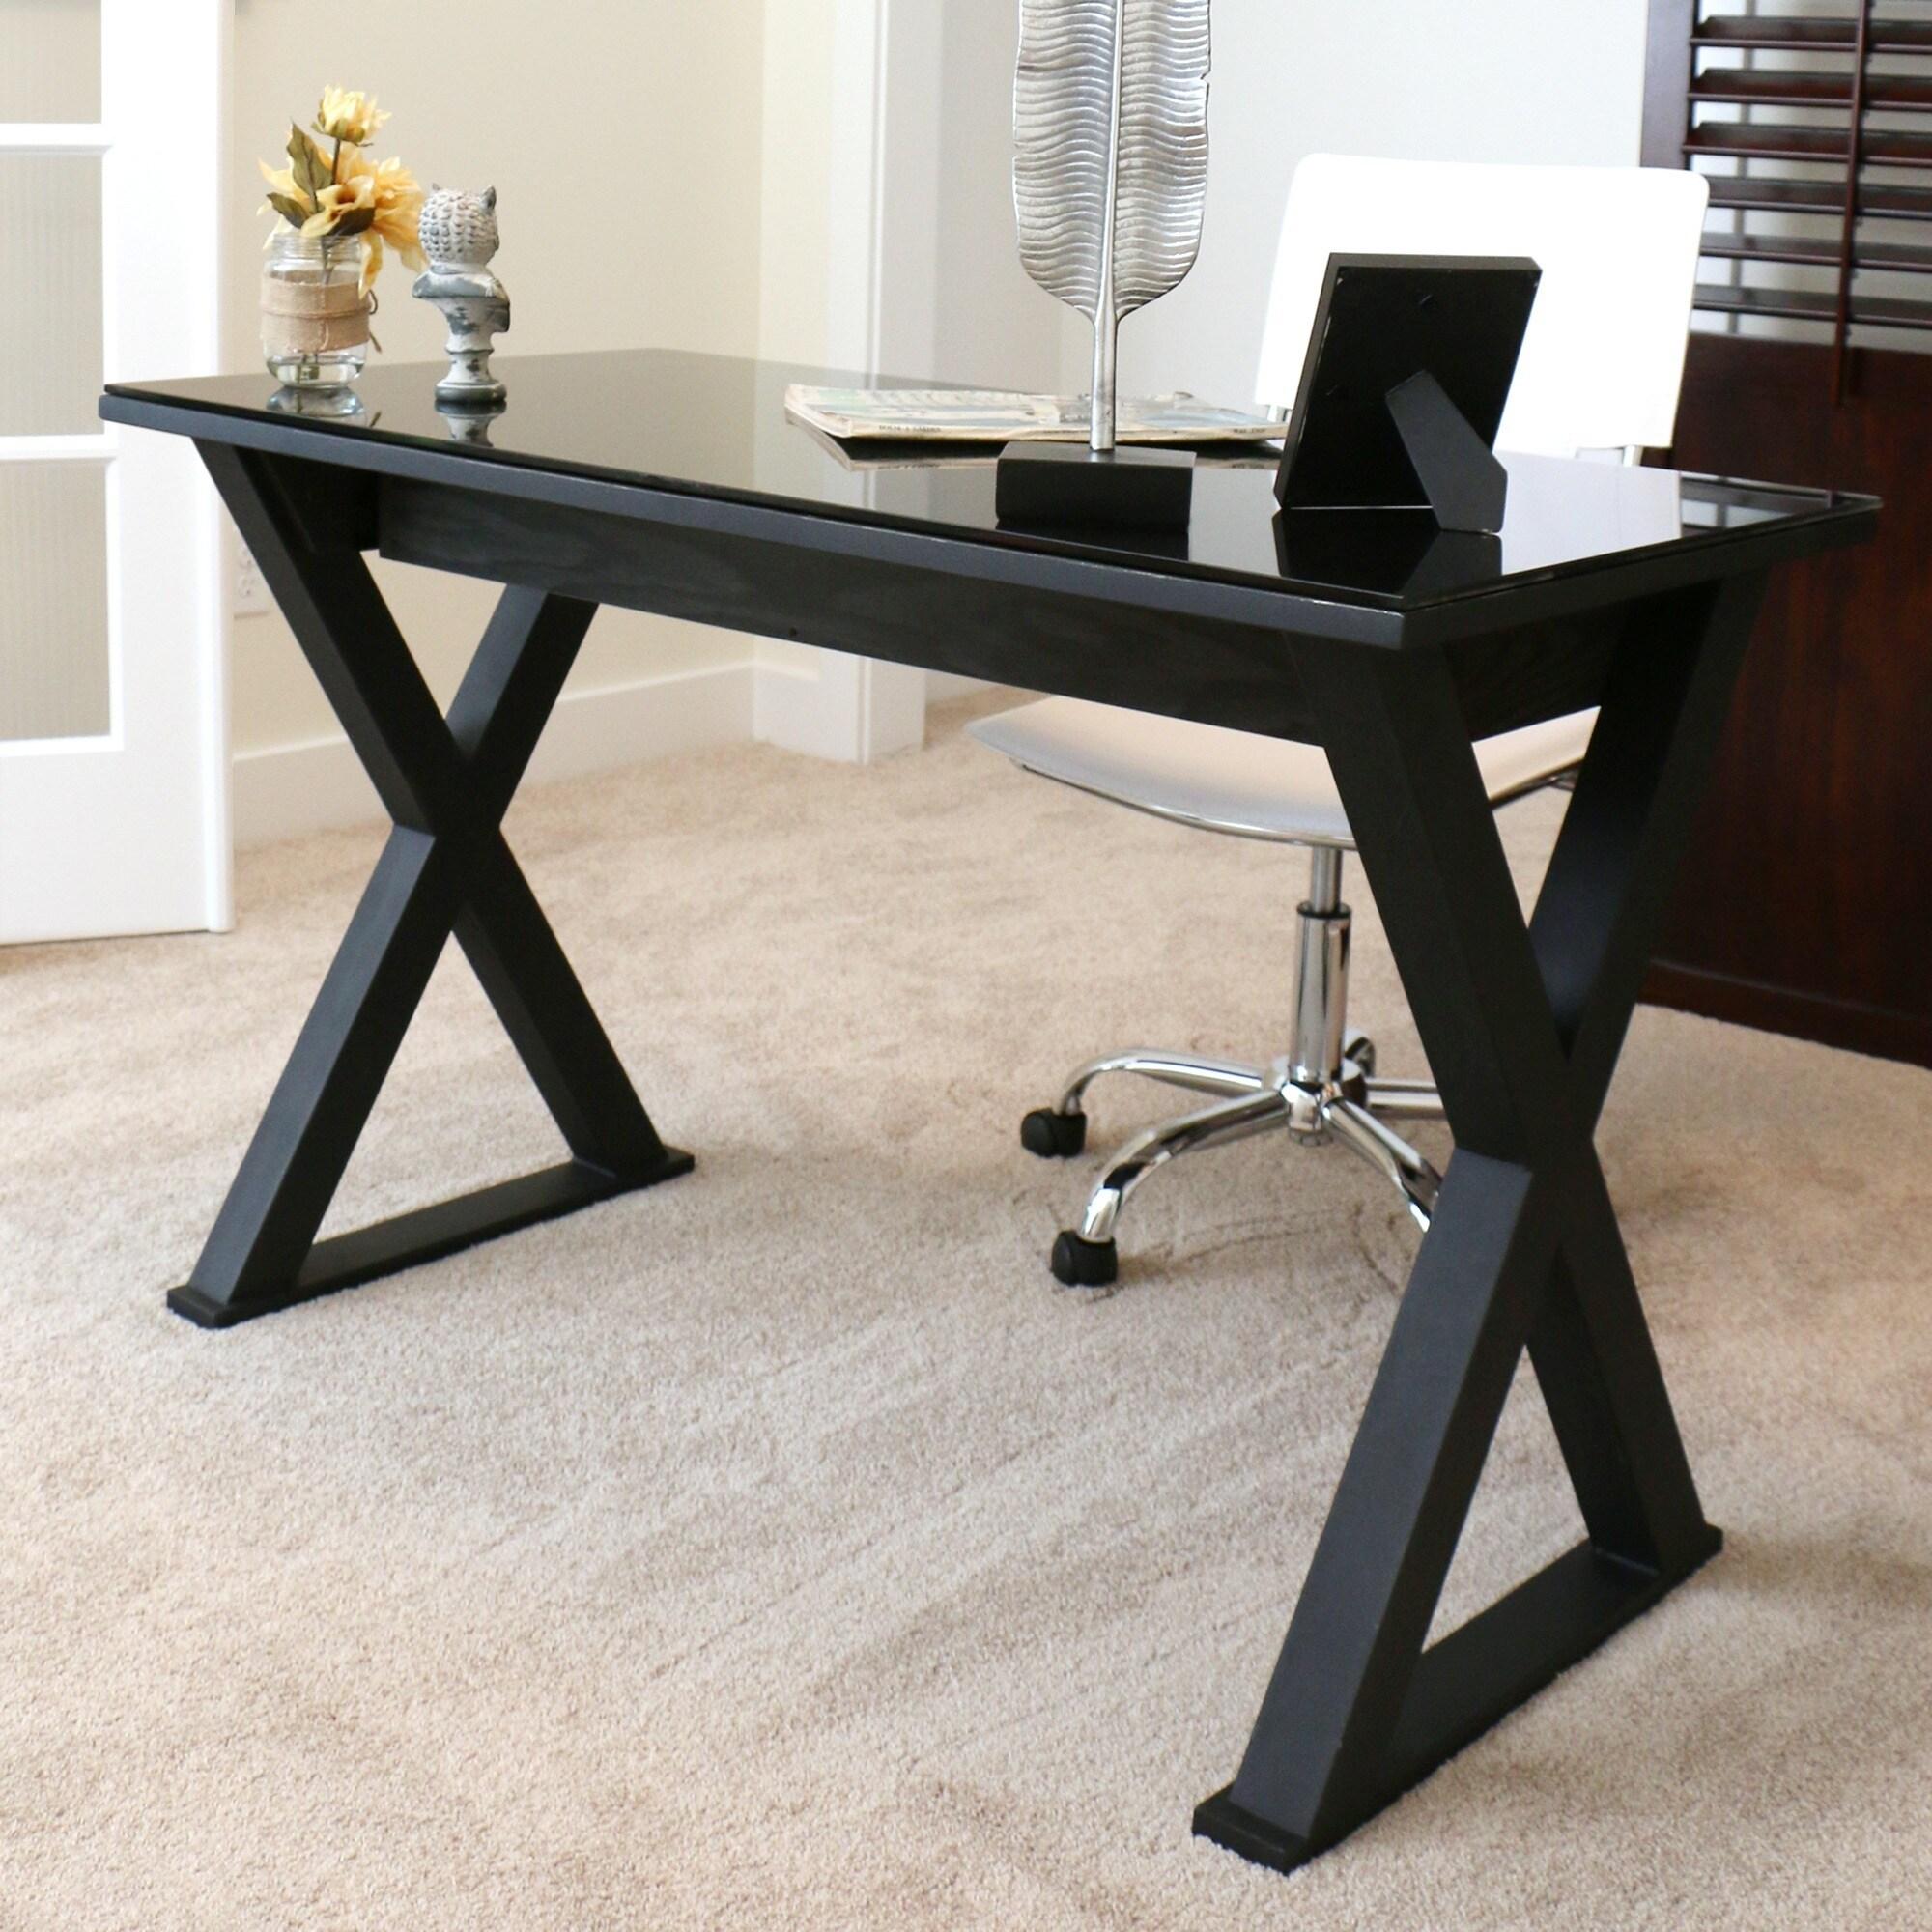 48-inch Black Glass Computer Desk (48 in. Black Glass Met...